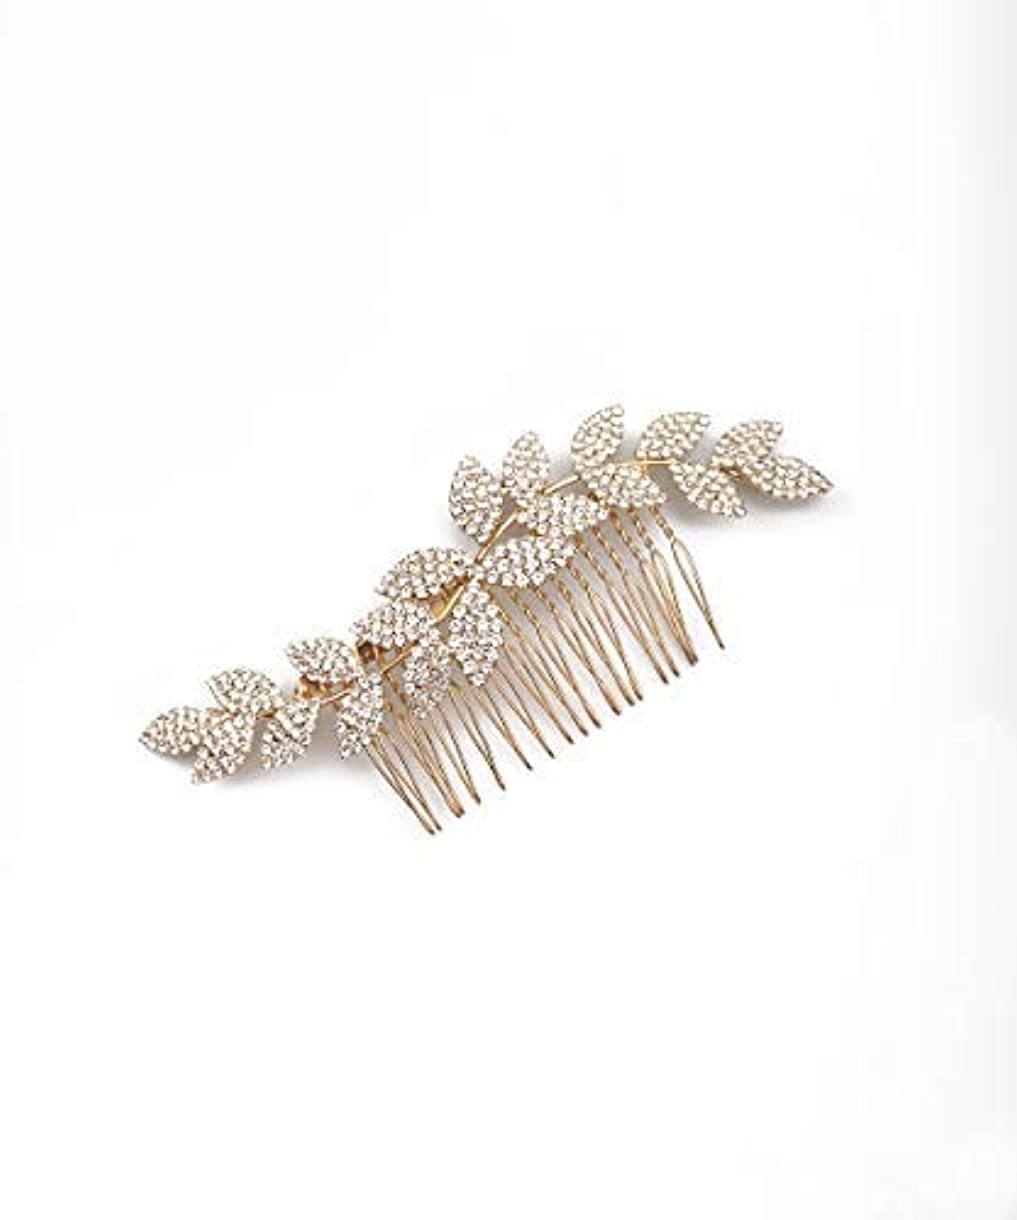 Deniferymakeup Crystal Bridal Headpiece Bridal Hair Accessories Wedding Hair Piece Wedding Headpiece Bridal Jewelry...